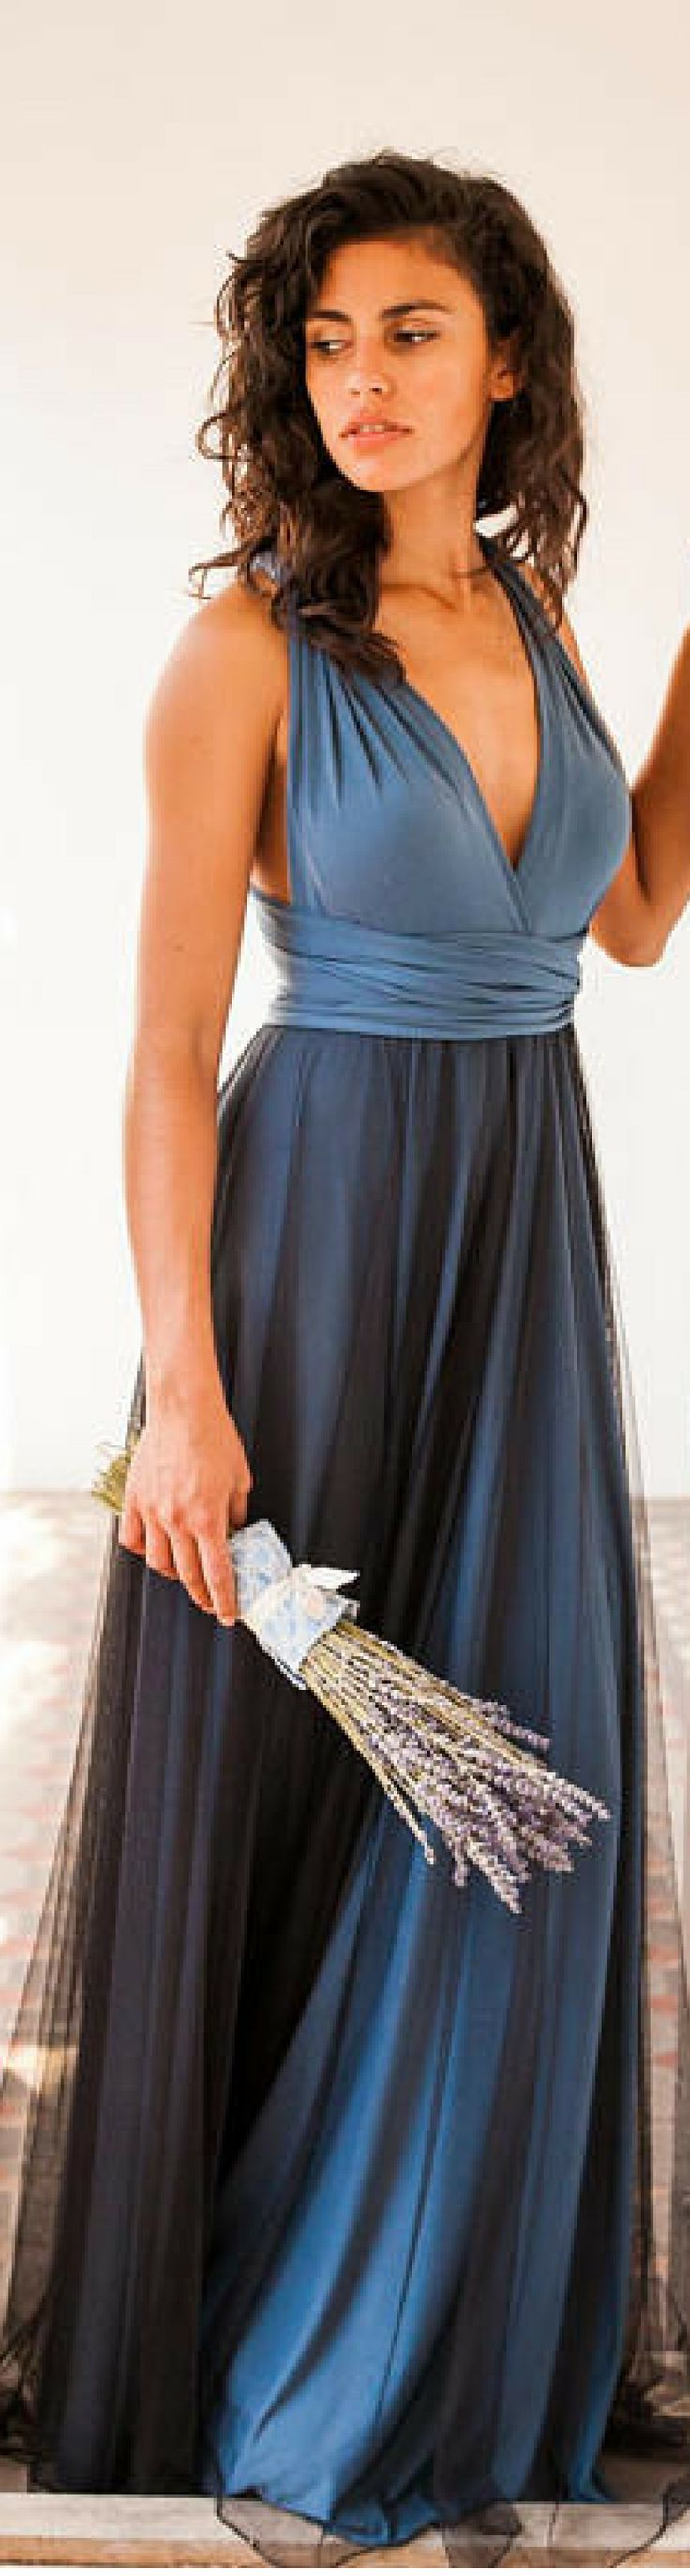 Bridesmaid long dress, beige bridesmaids dresses, backless long dress, champagne long dress, cream long dress, event gown, long prom dress #affiliate